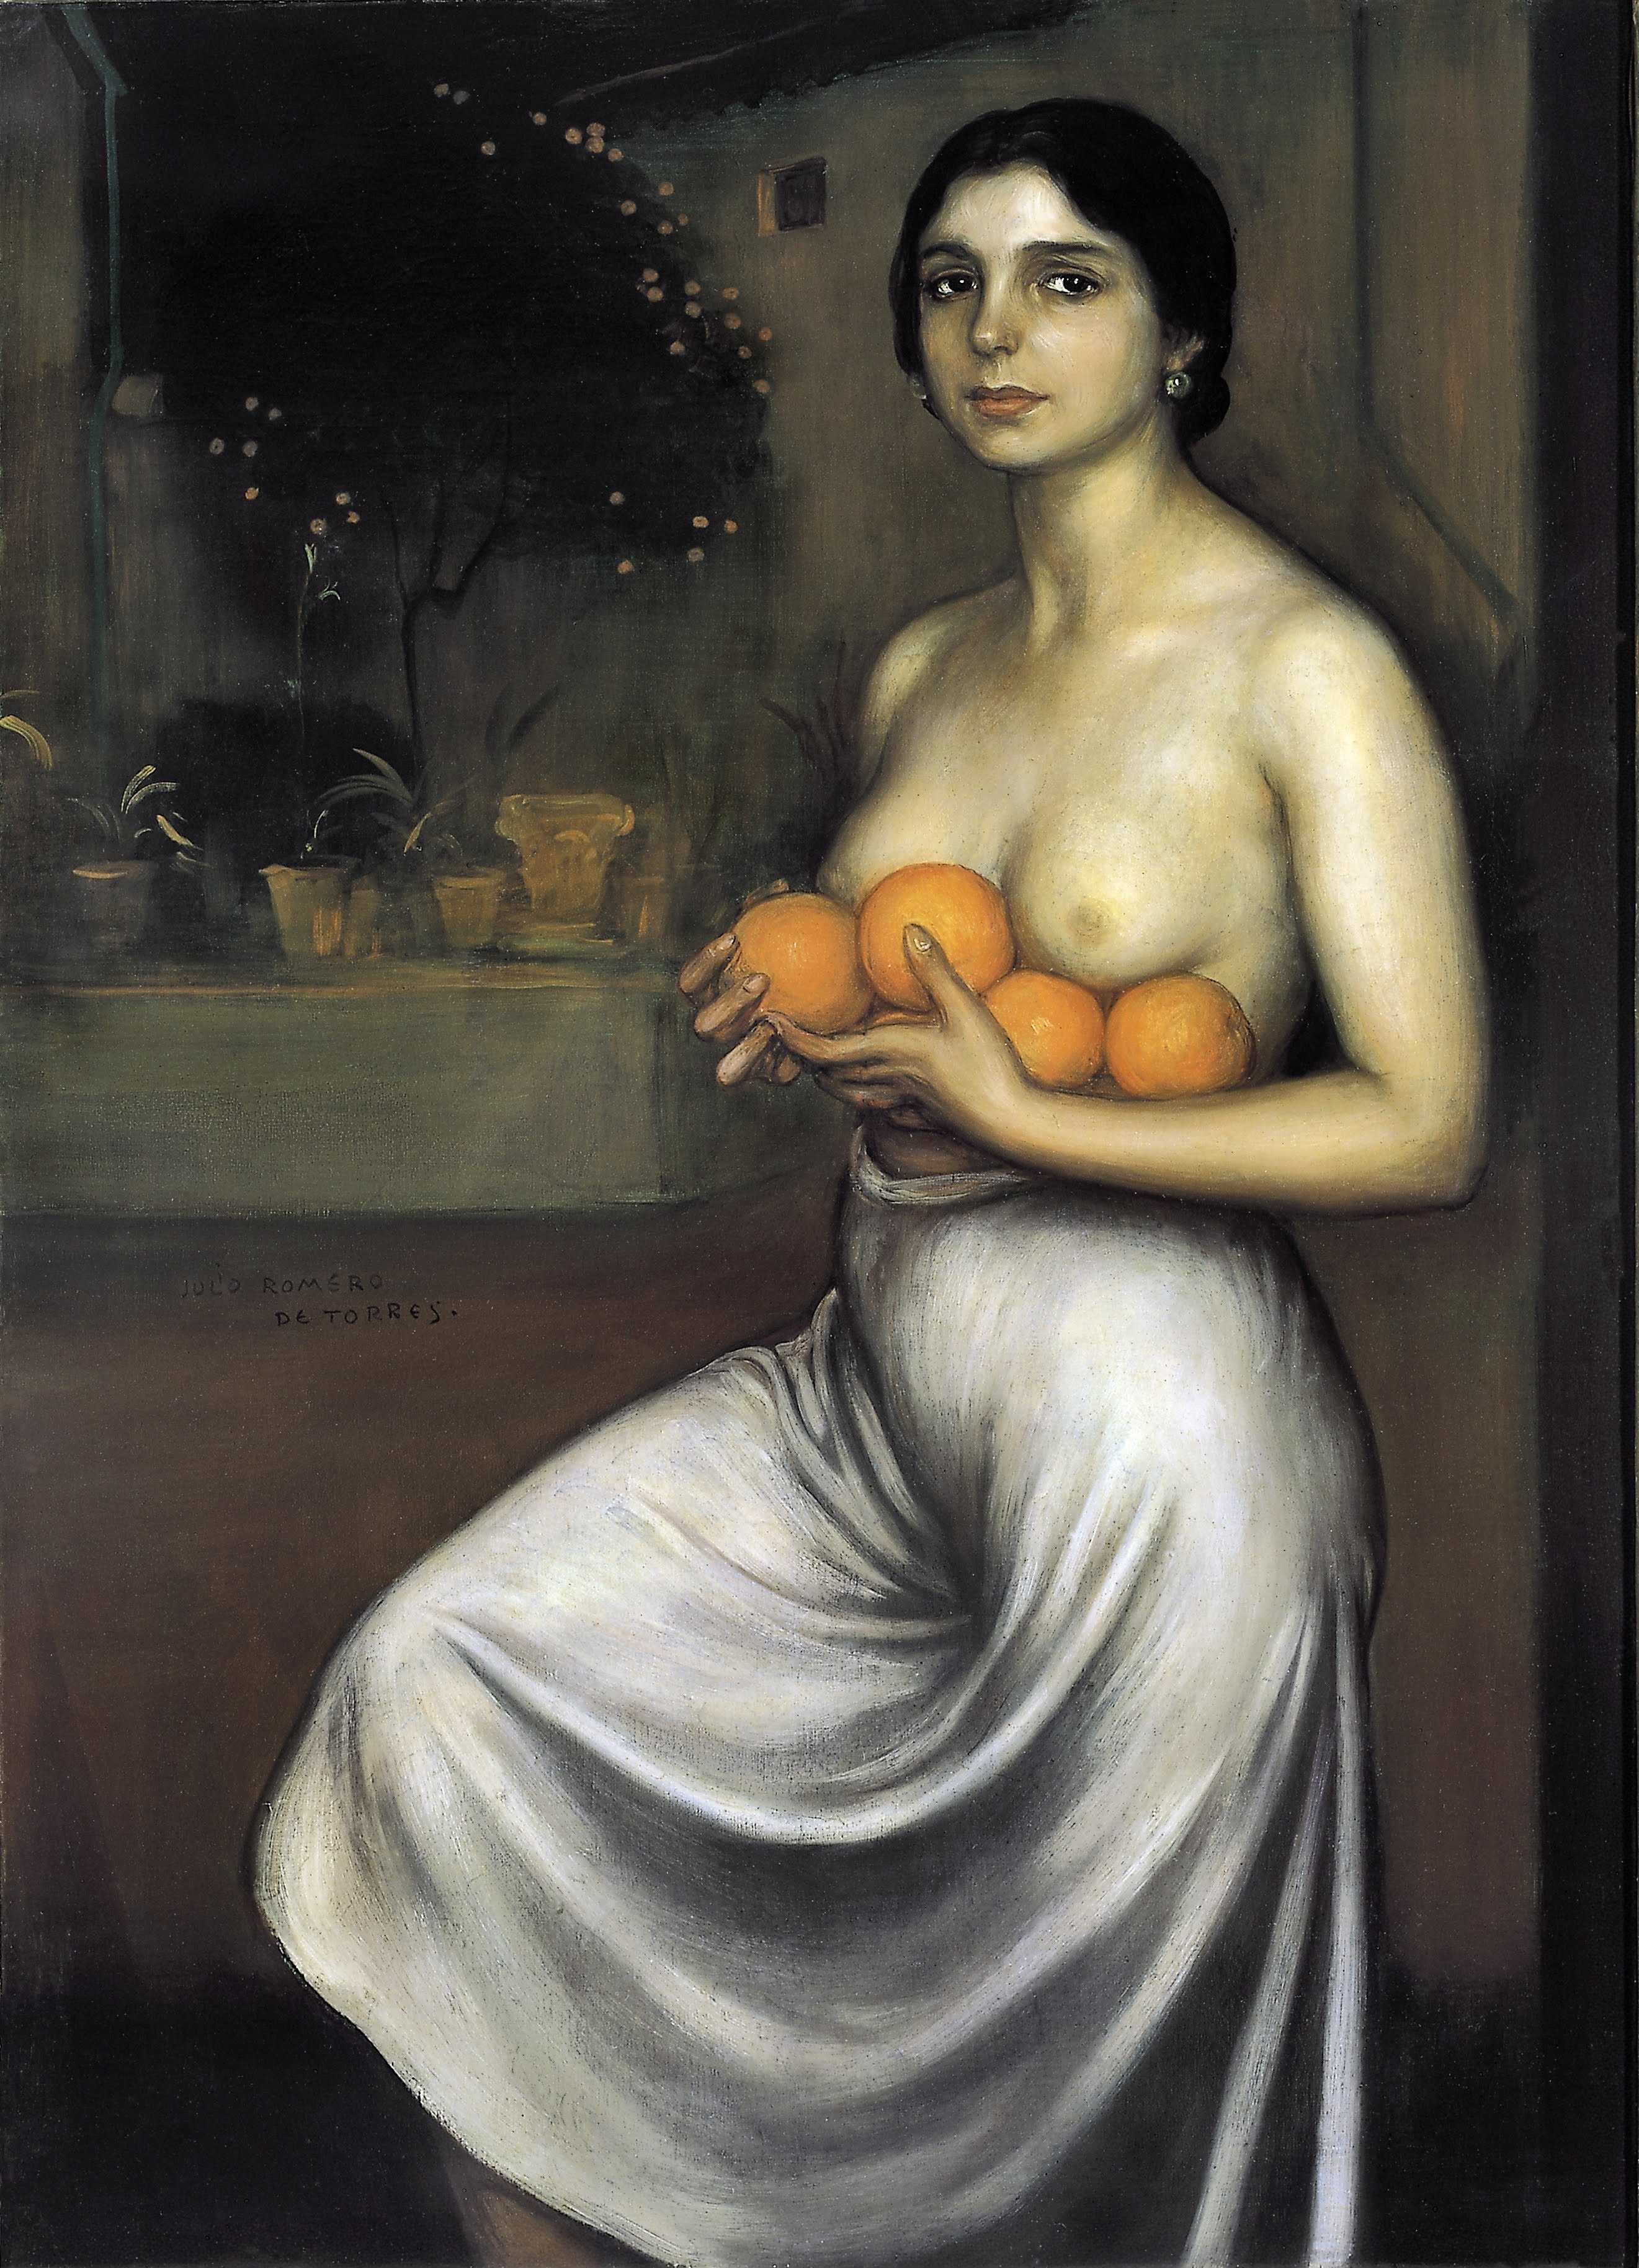 http://upload.wikimedia.org/wikipedia/commons/8/8c/Naranjas_y_limones_by_Julio_Romero_de_Torres.jpg?uselang=es